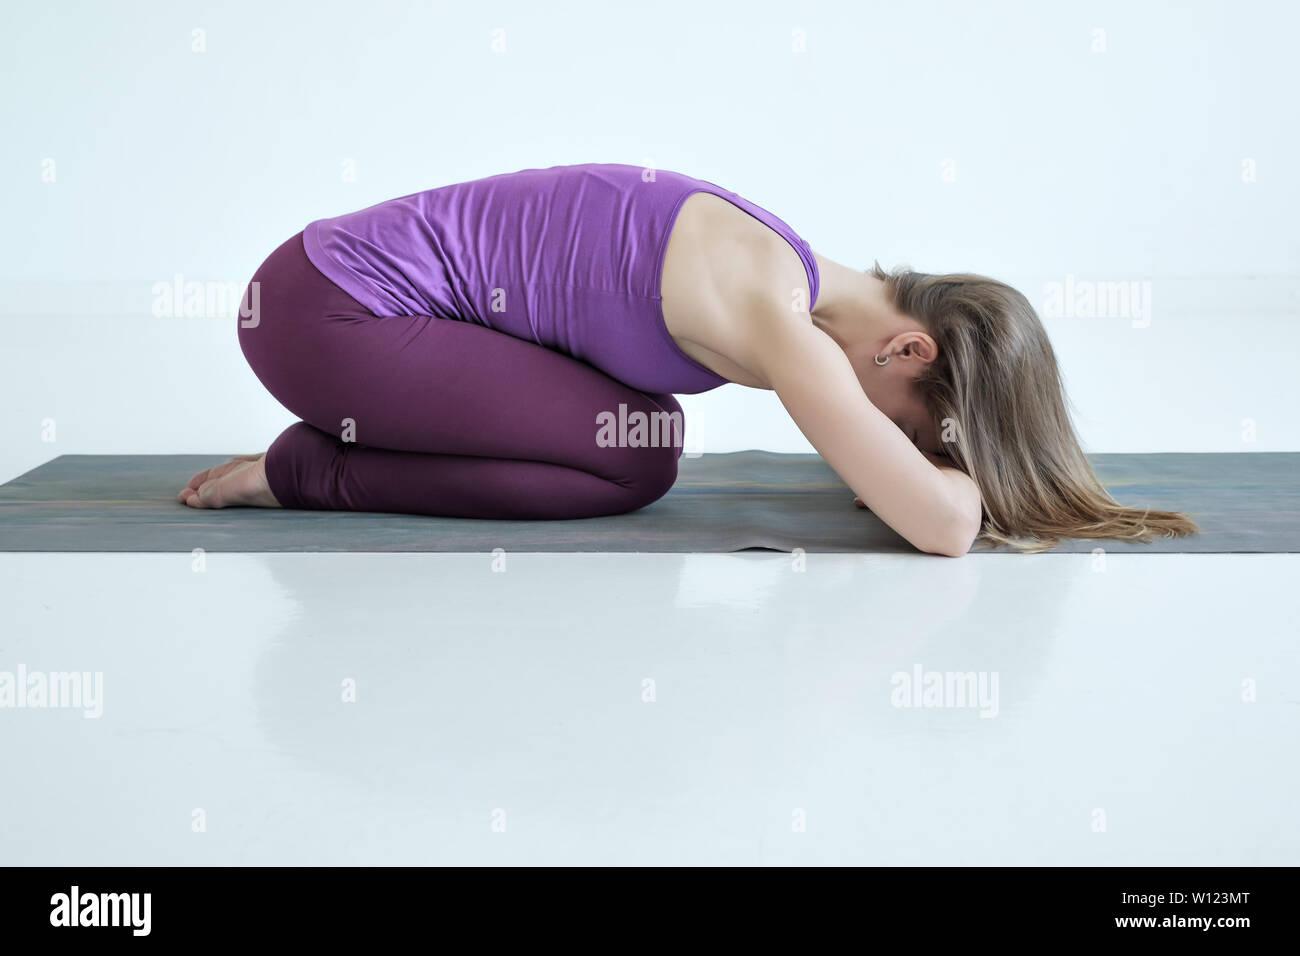 Caucasian woman practices yoga asana balasana or child pose - Stock Image